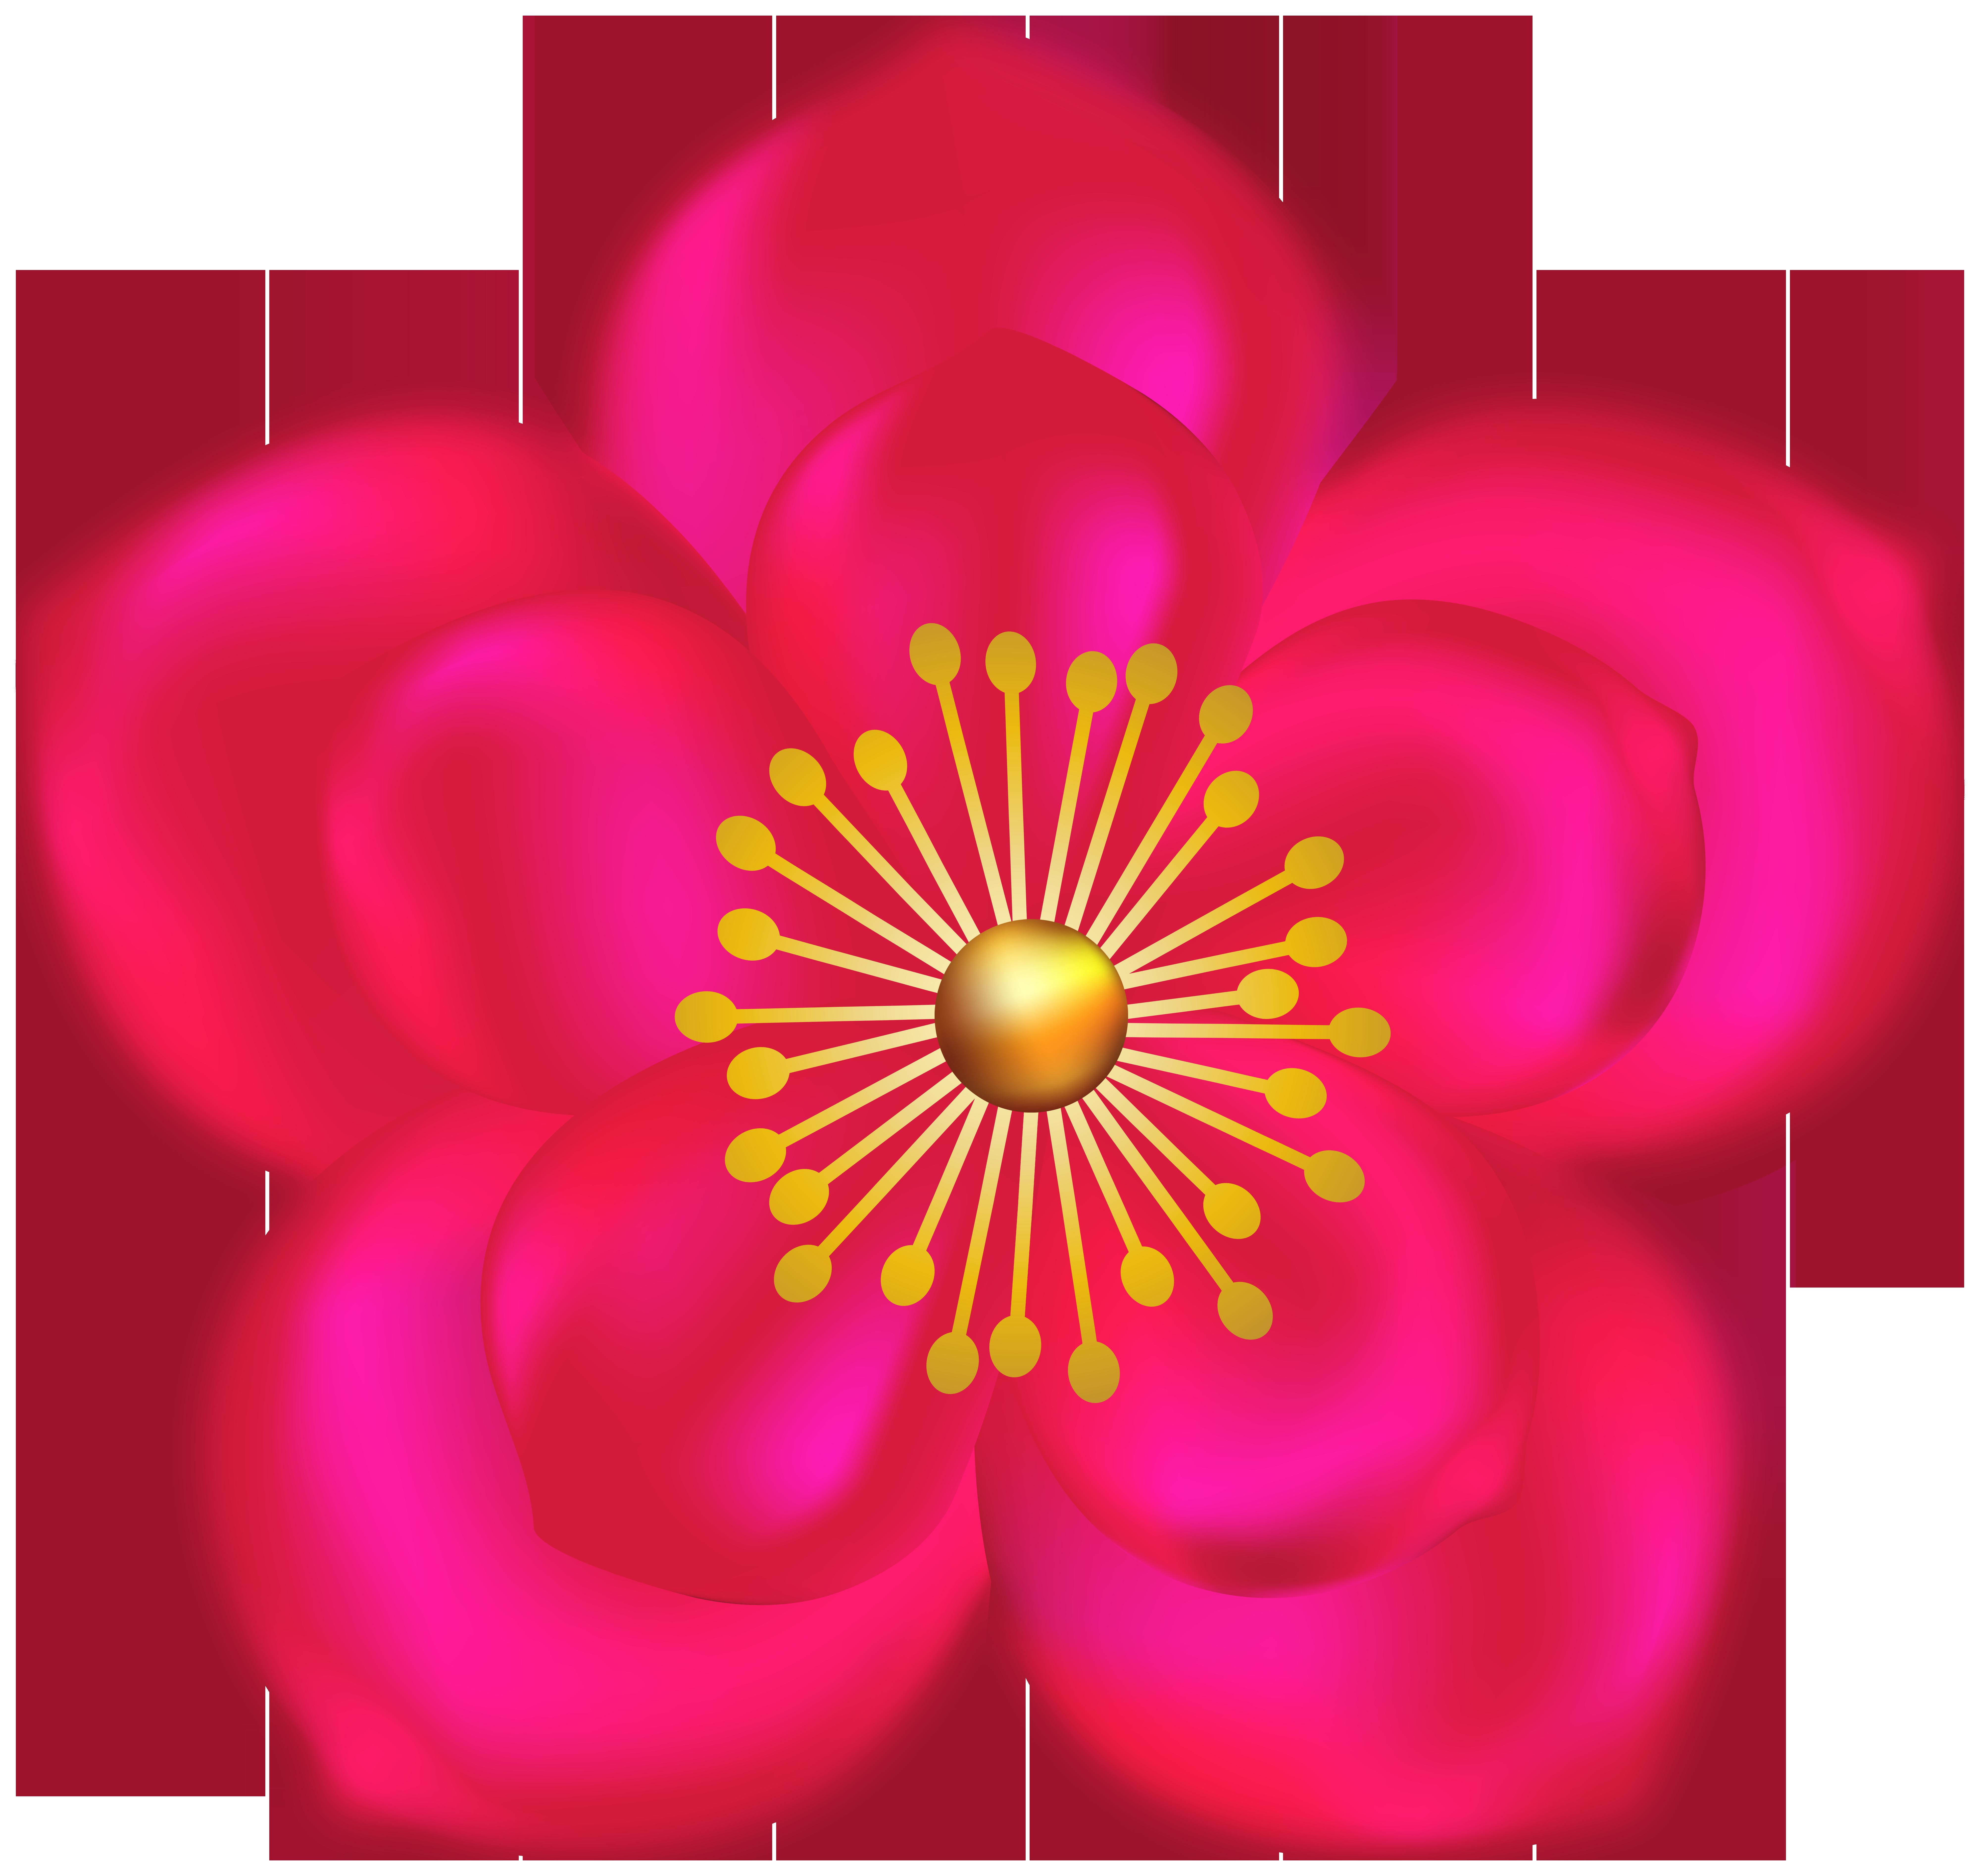 Fuchsia Flower Transparent Image.